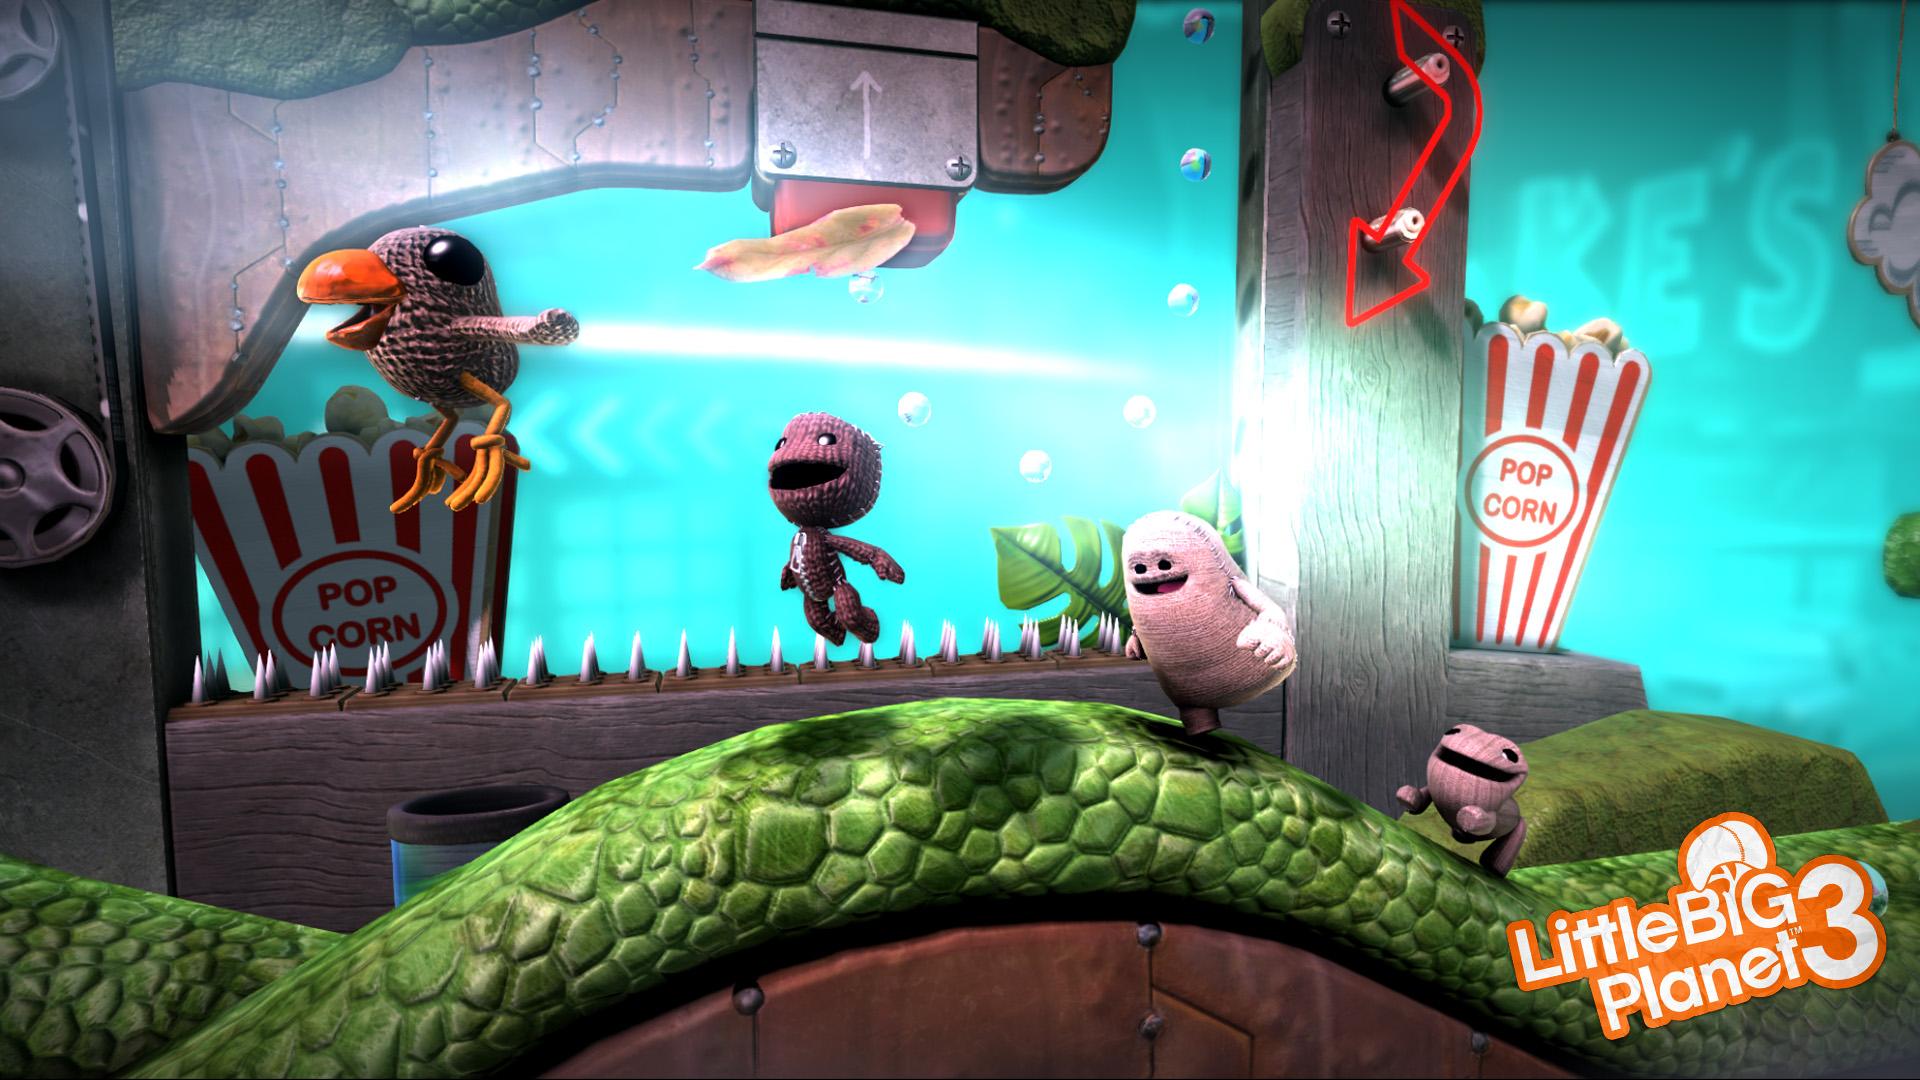 LittleBigPlanet3 PS4 Editeur 008